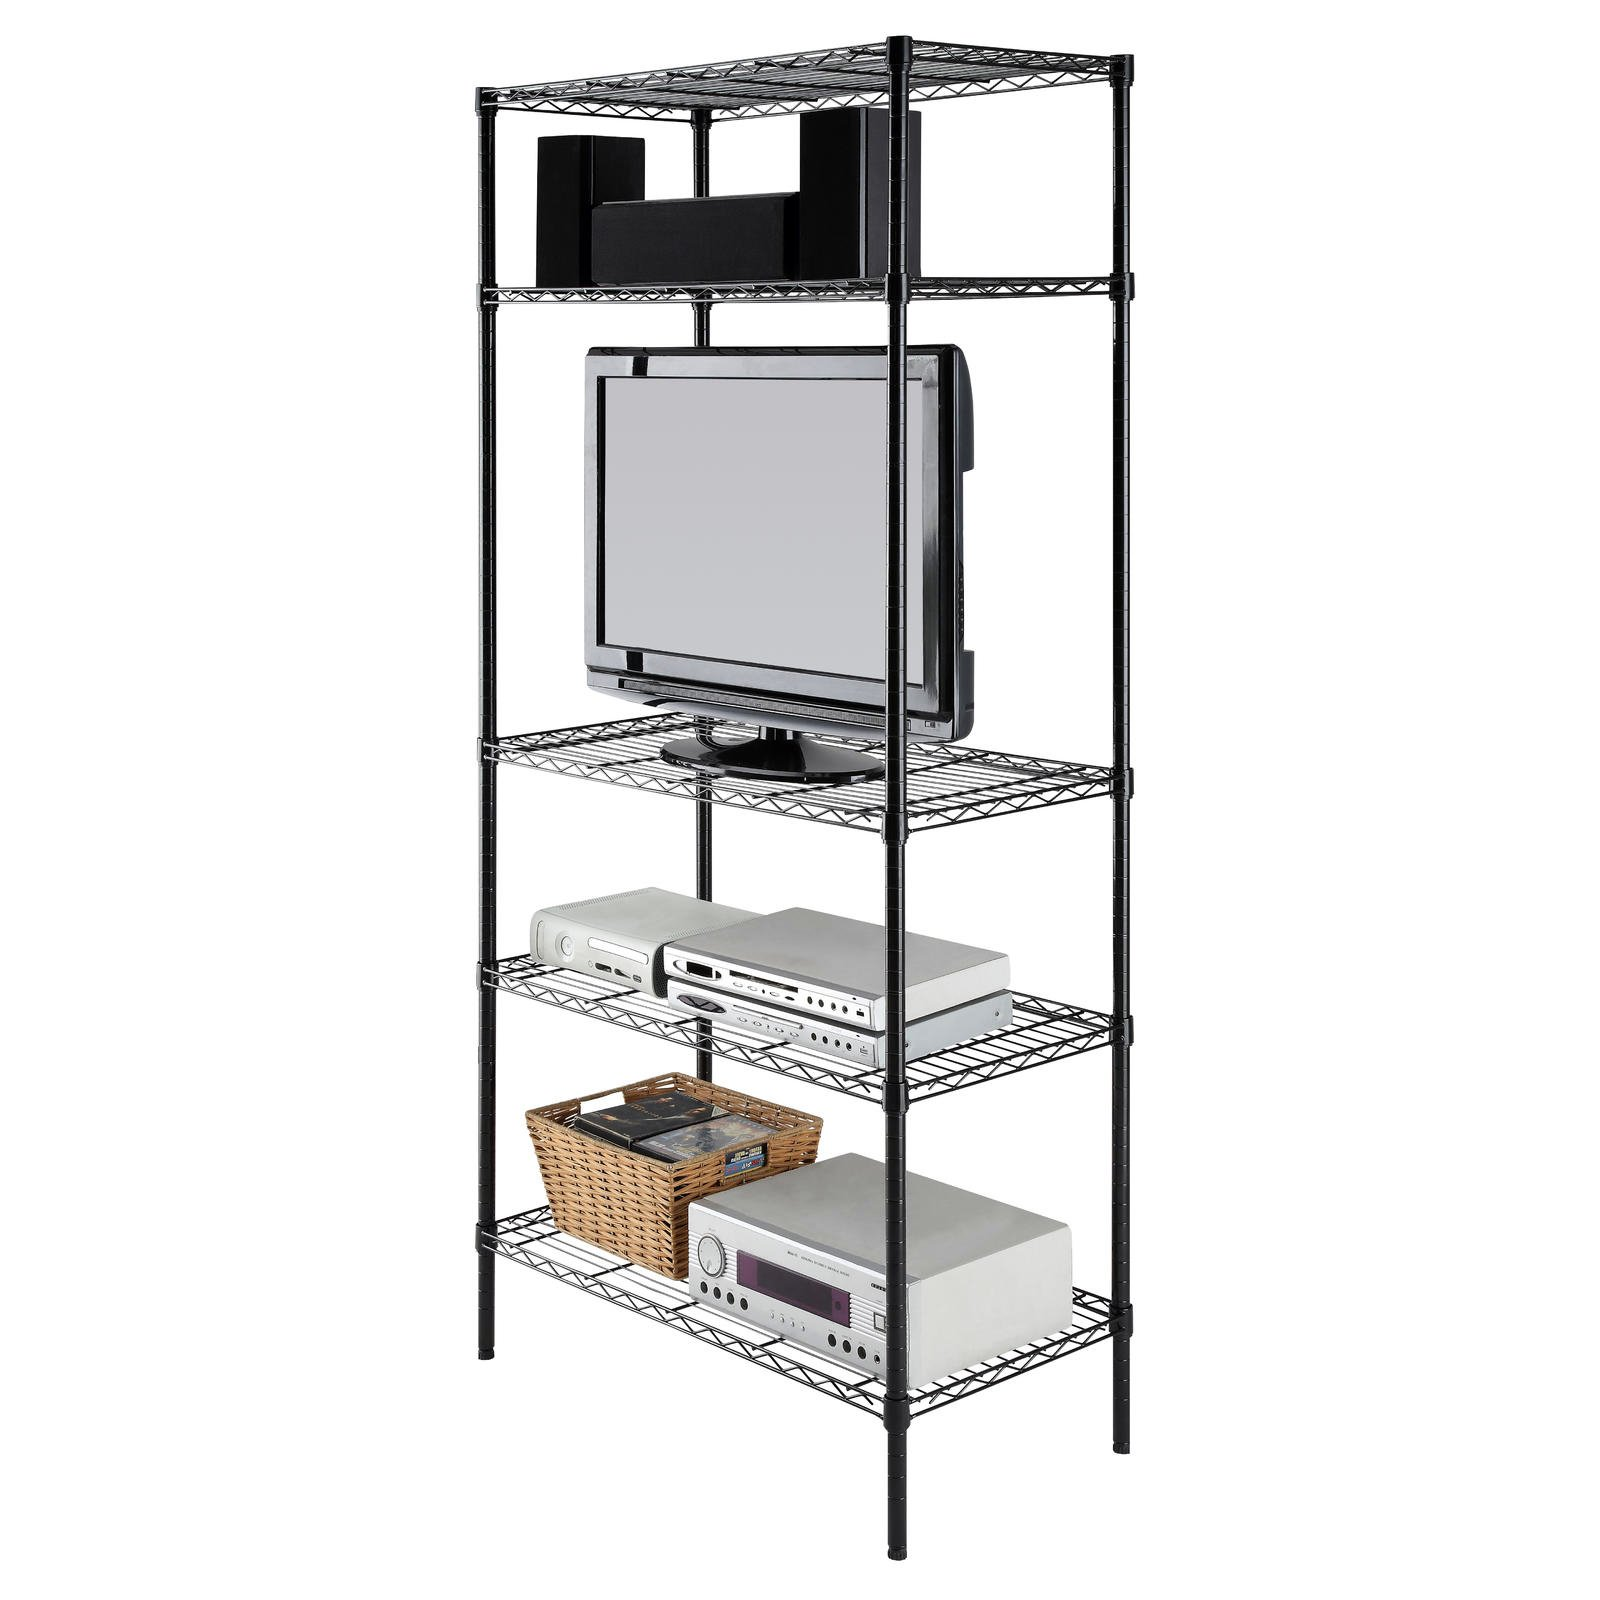 Garage Storage 5 Tier Shelving Unit Black Shelf Deep Shelves